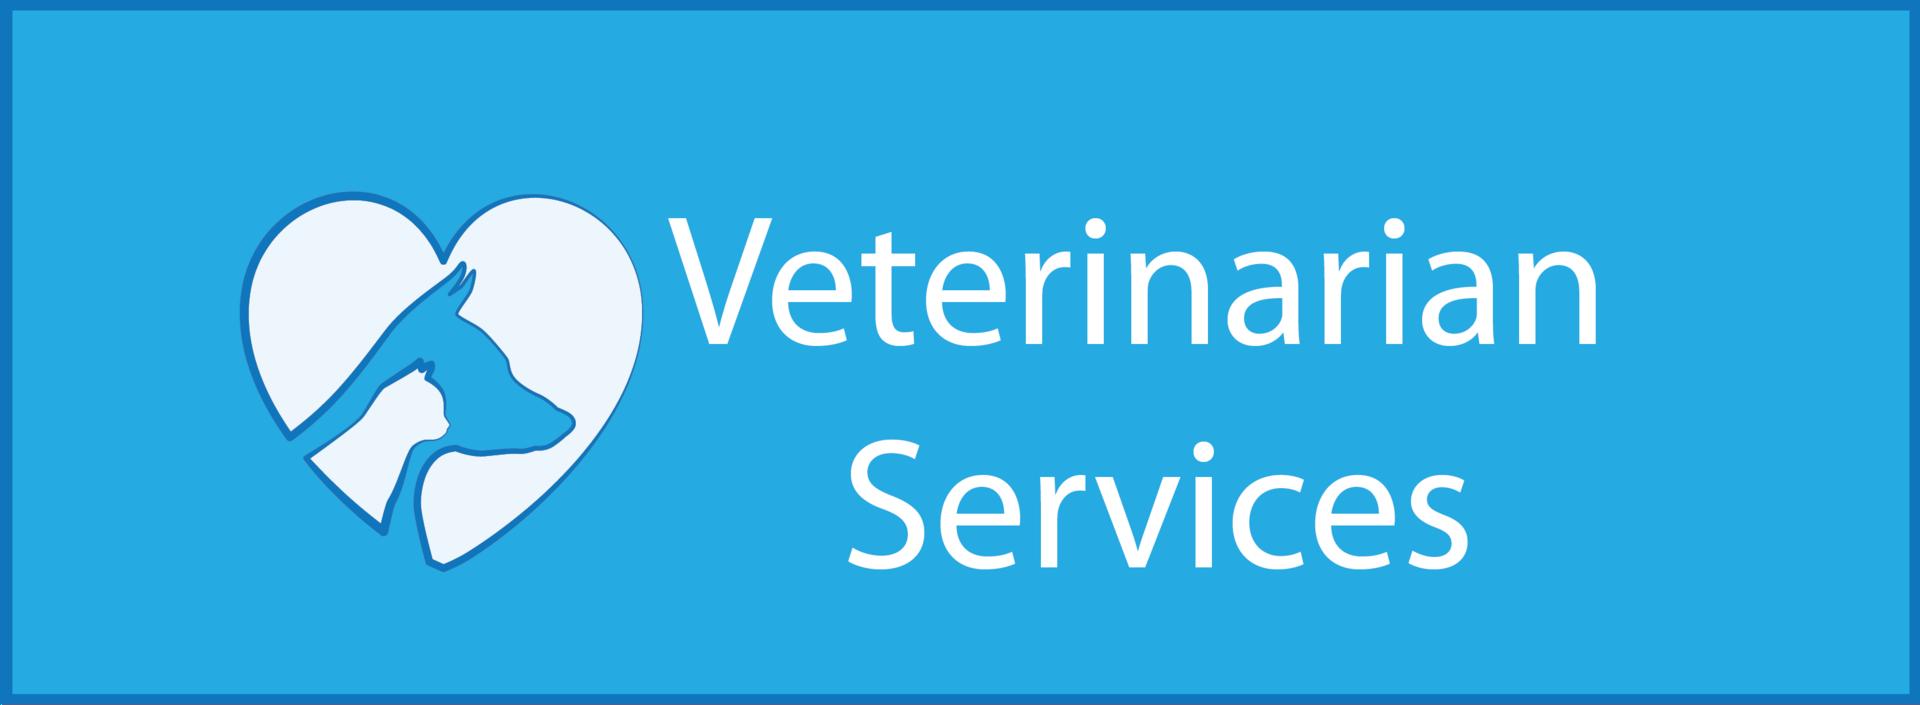 Veterinarian services